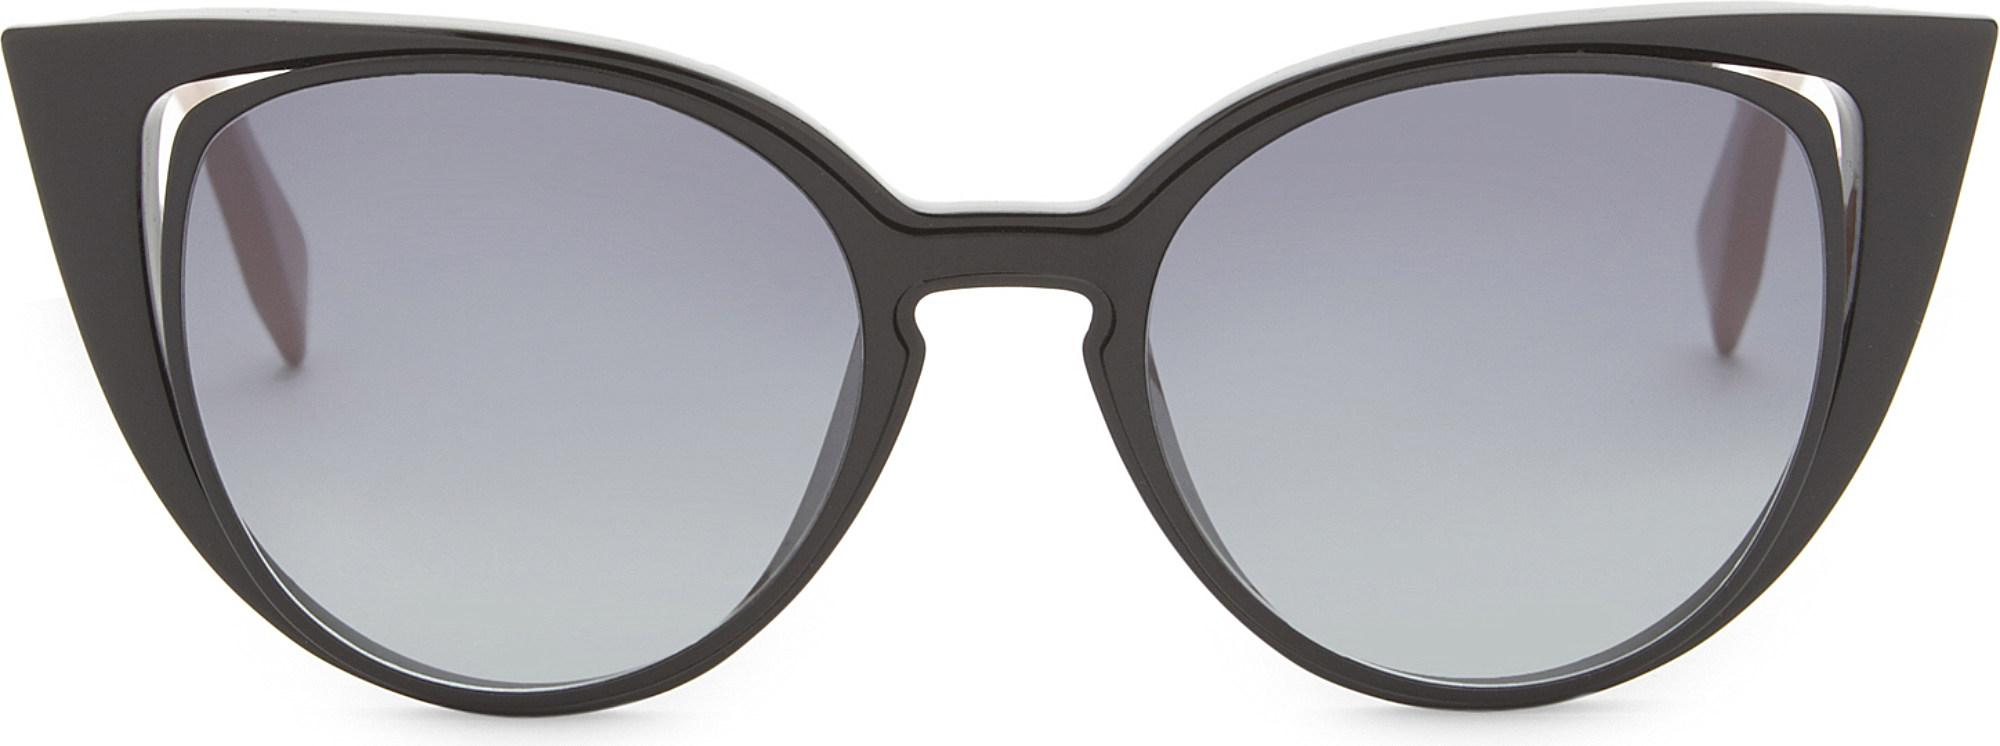 2d722a452ea Lyst - Fendi Ff0136 Cat-eye Sunglasses in Black